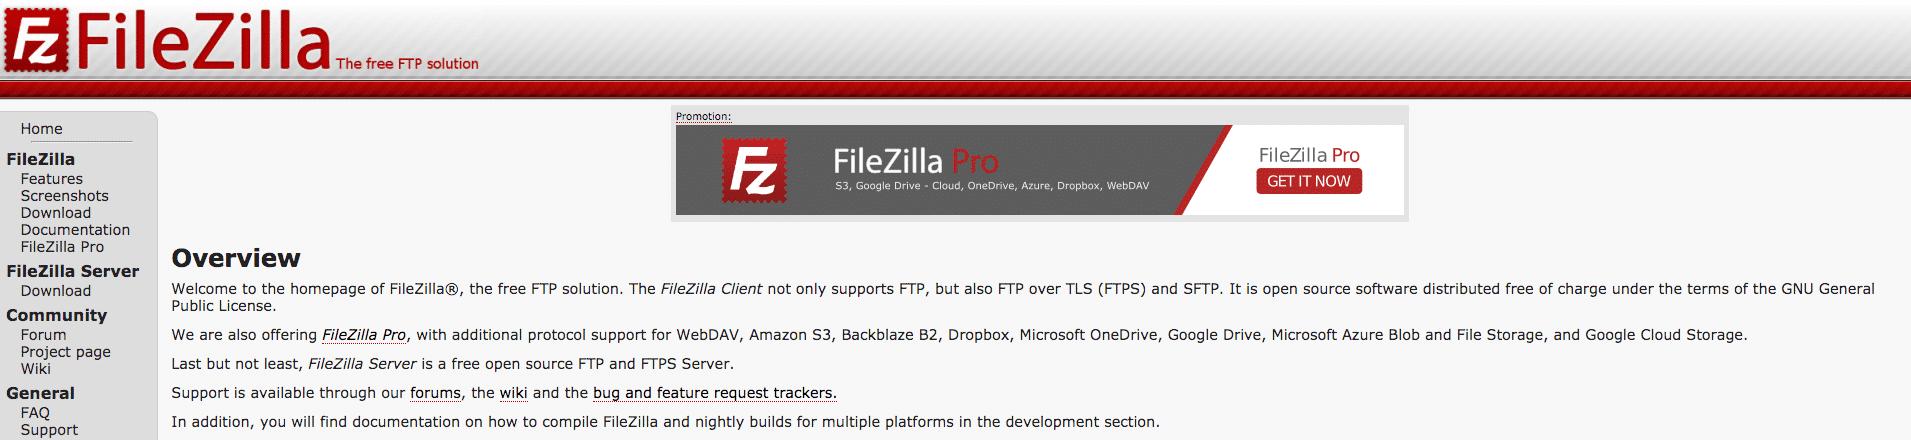 FileZilla-home